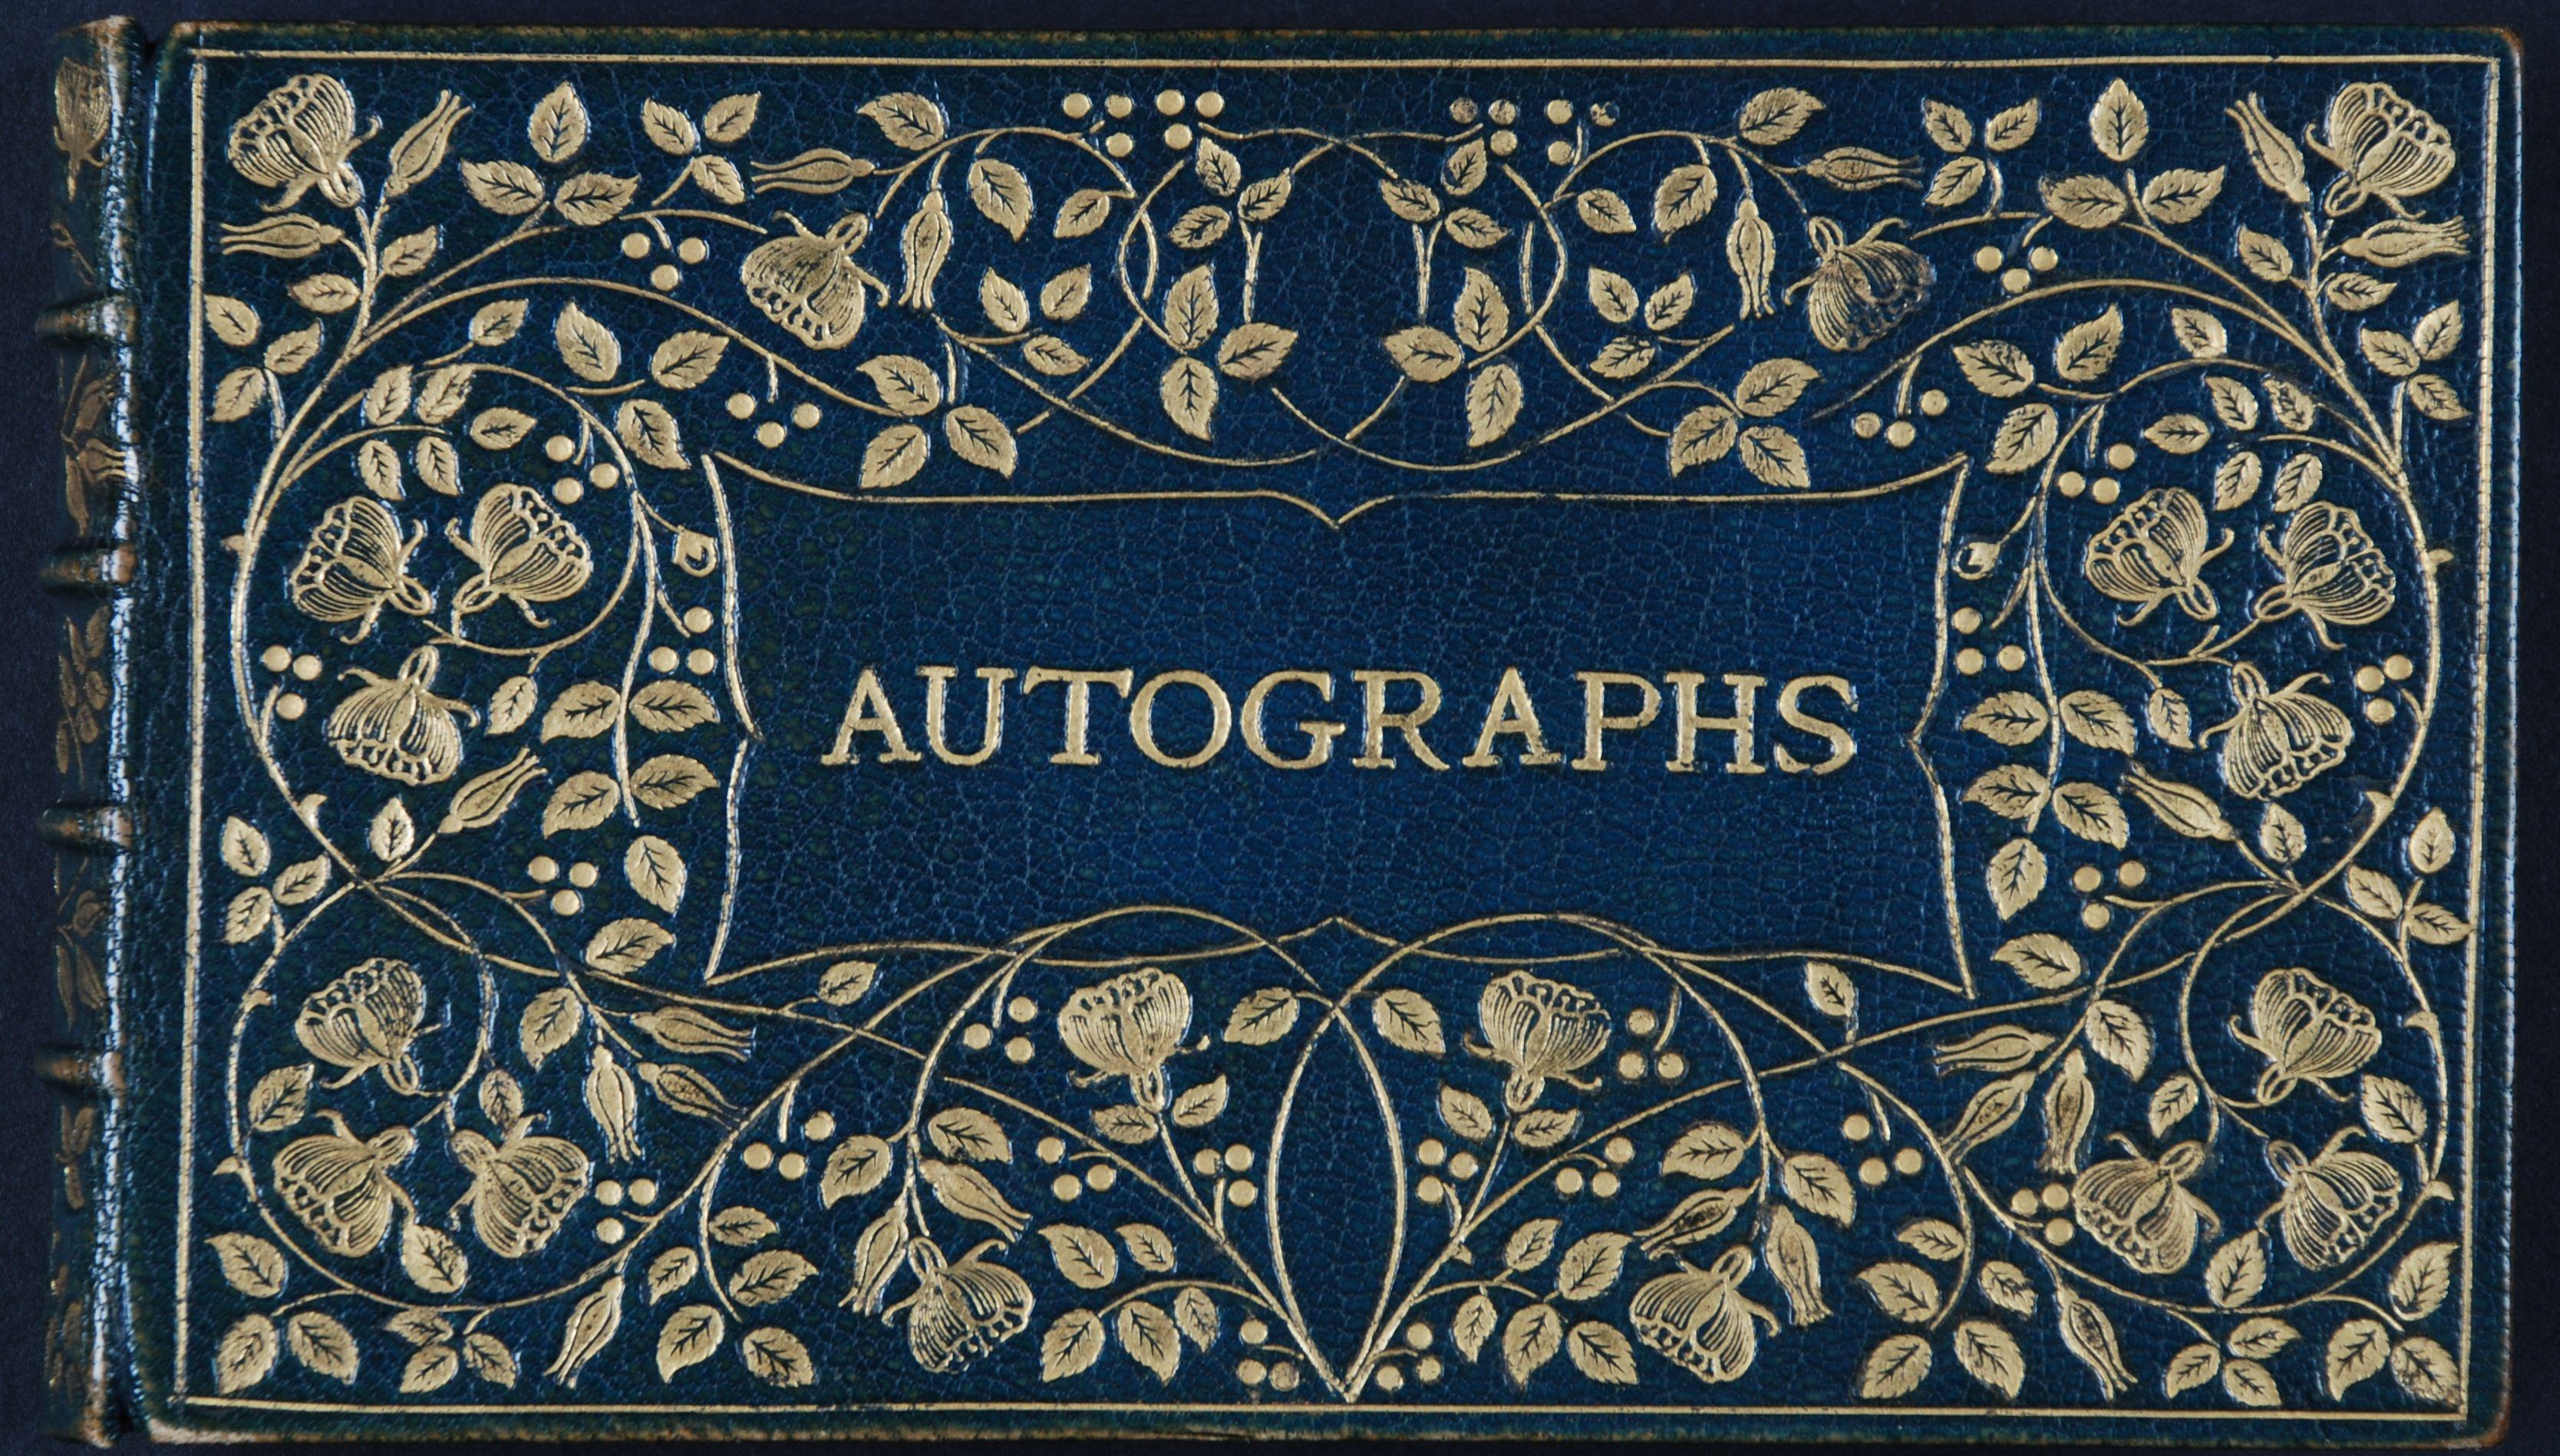 Autographs: collected by M.E. Joachim.